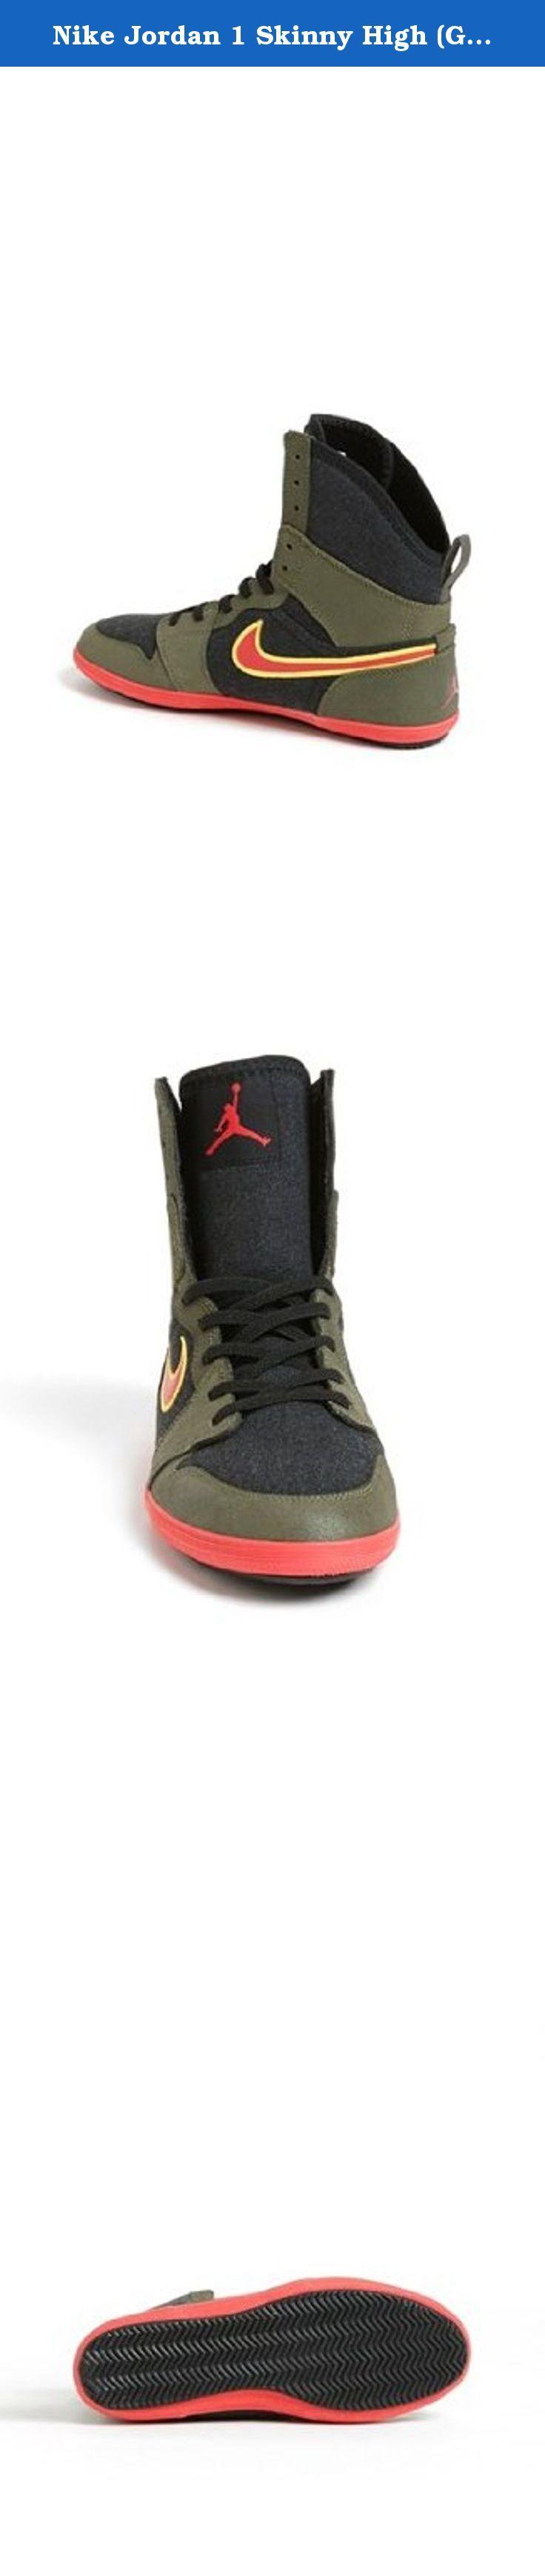 Nike Jordan 1 Skinny High (GS) Grade School Kids Shoes Color: Gym Red / White / Black 602656-601 (SIZE: 3.5Y). Nike Jordan 1 Skinny High (GS) Grade School Kids Shoes Color: Gym Red / White / Black 602656-601.